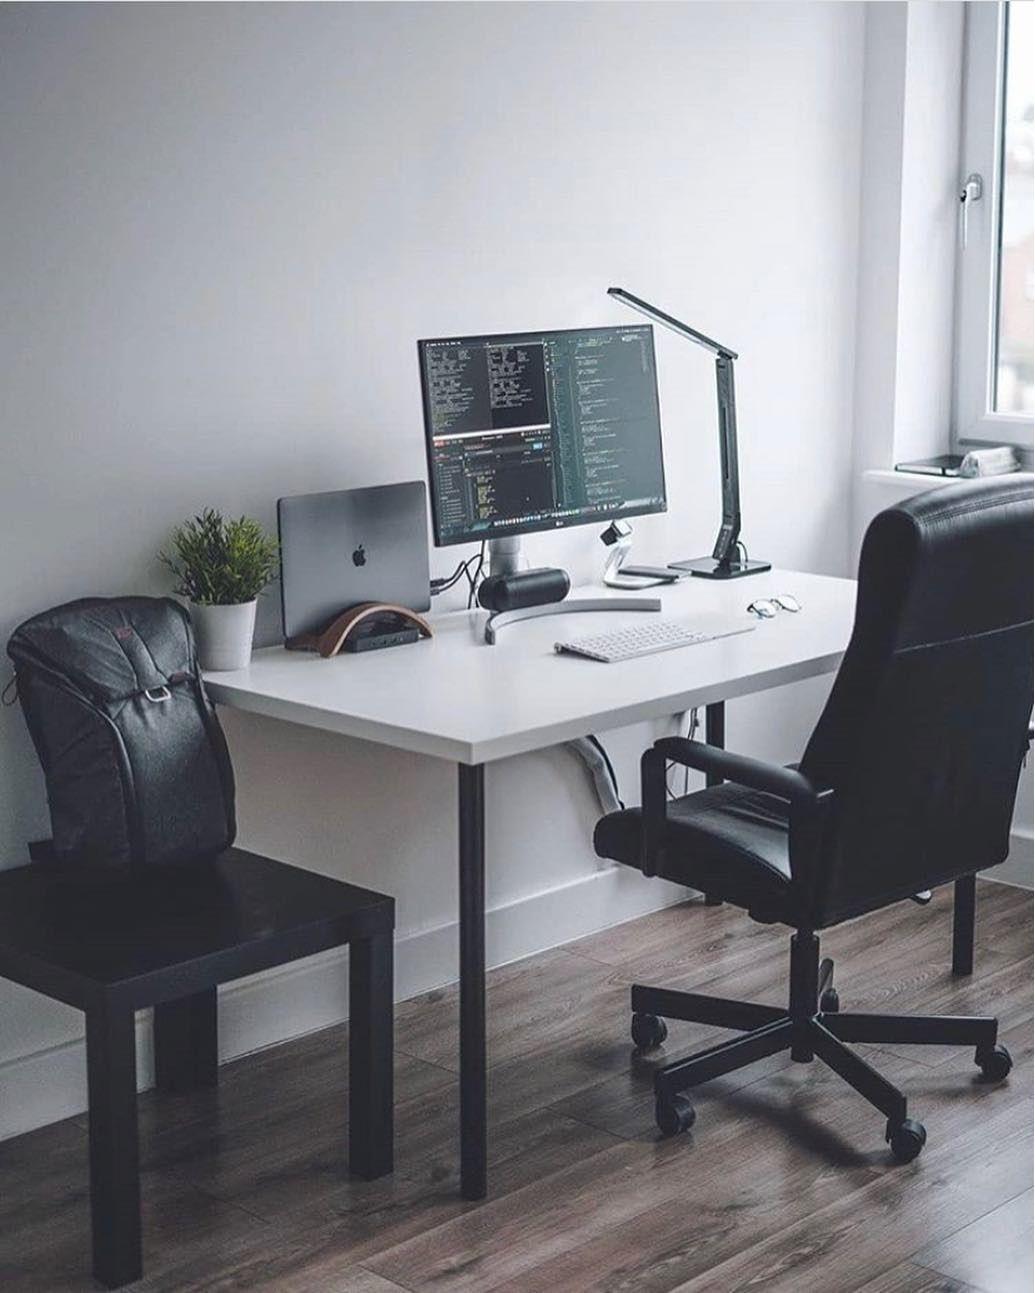 Desk Inspo On Instagram Desk Setup By Irvin Dev Follow